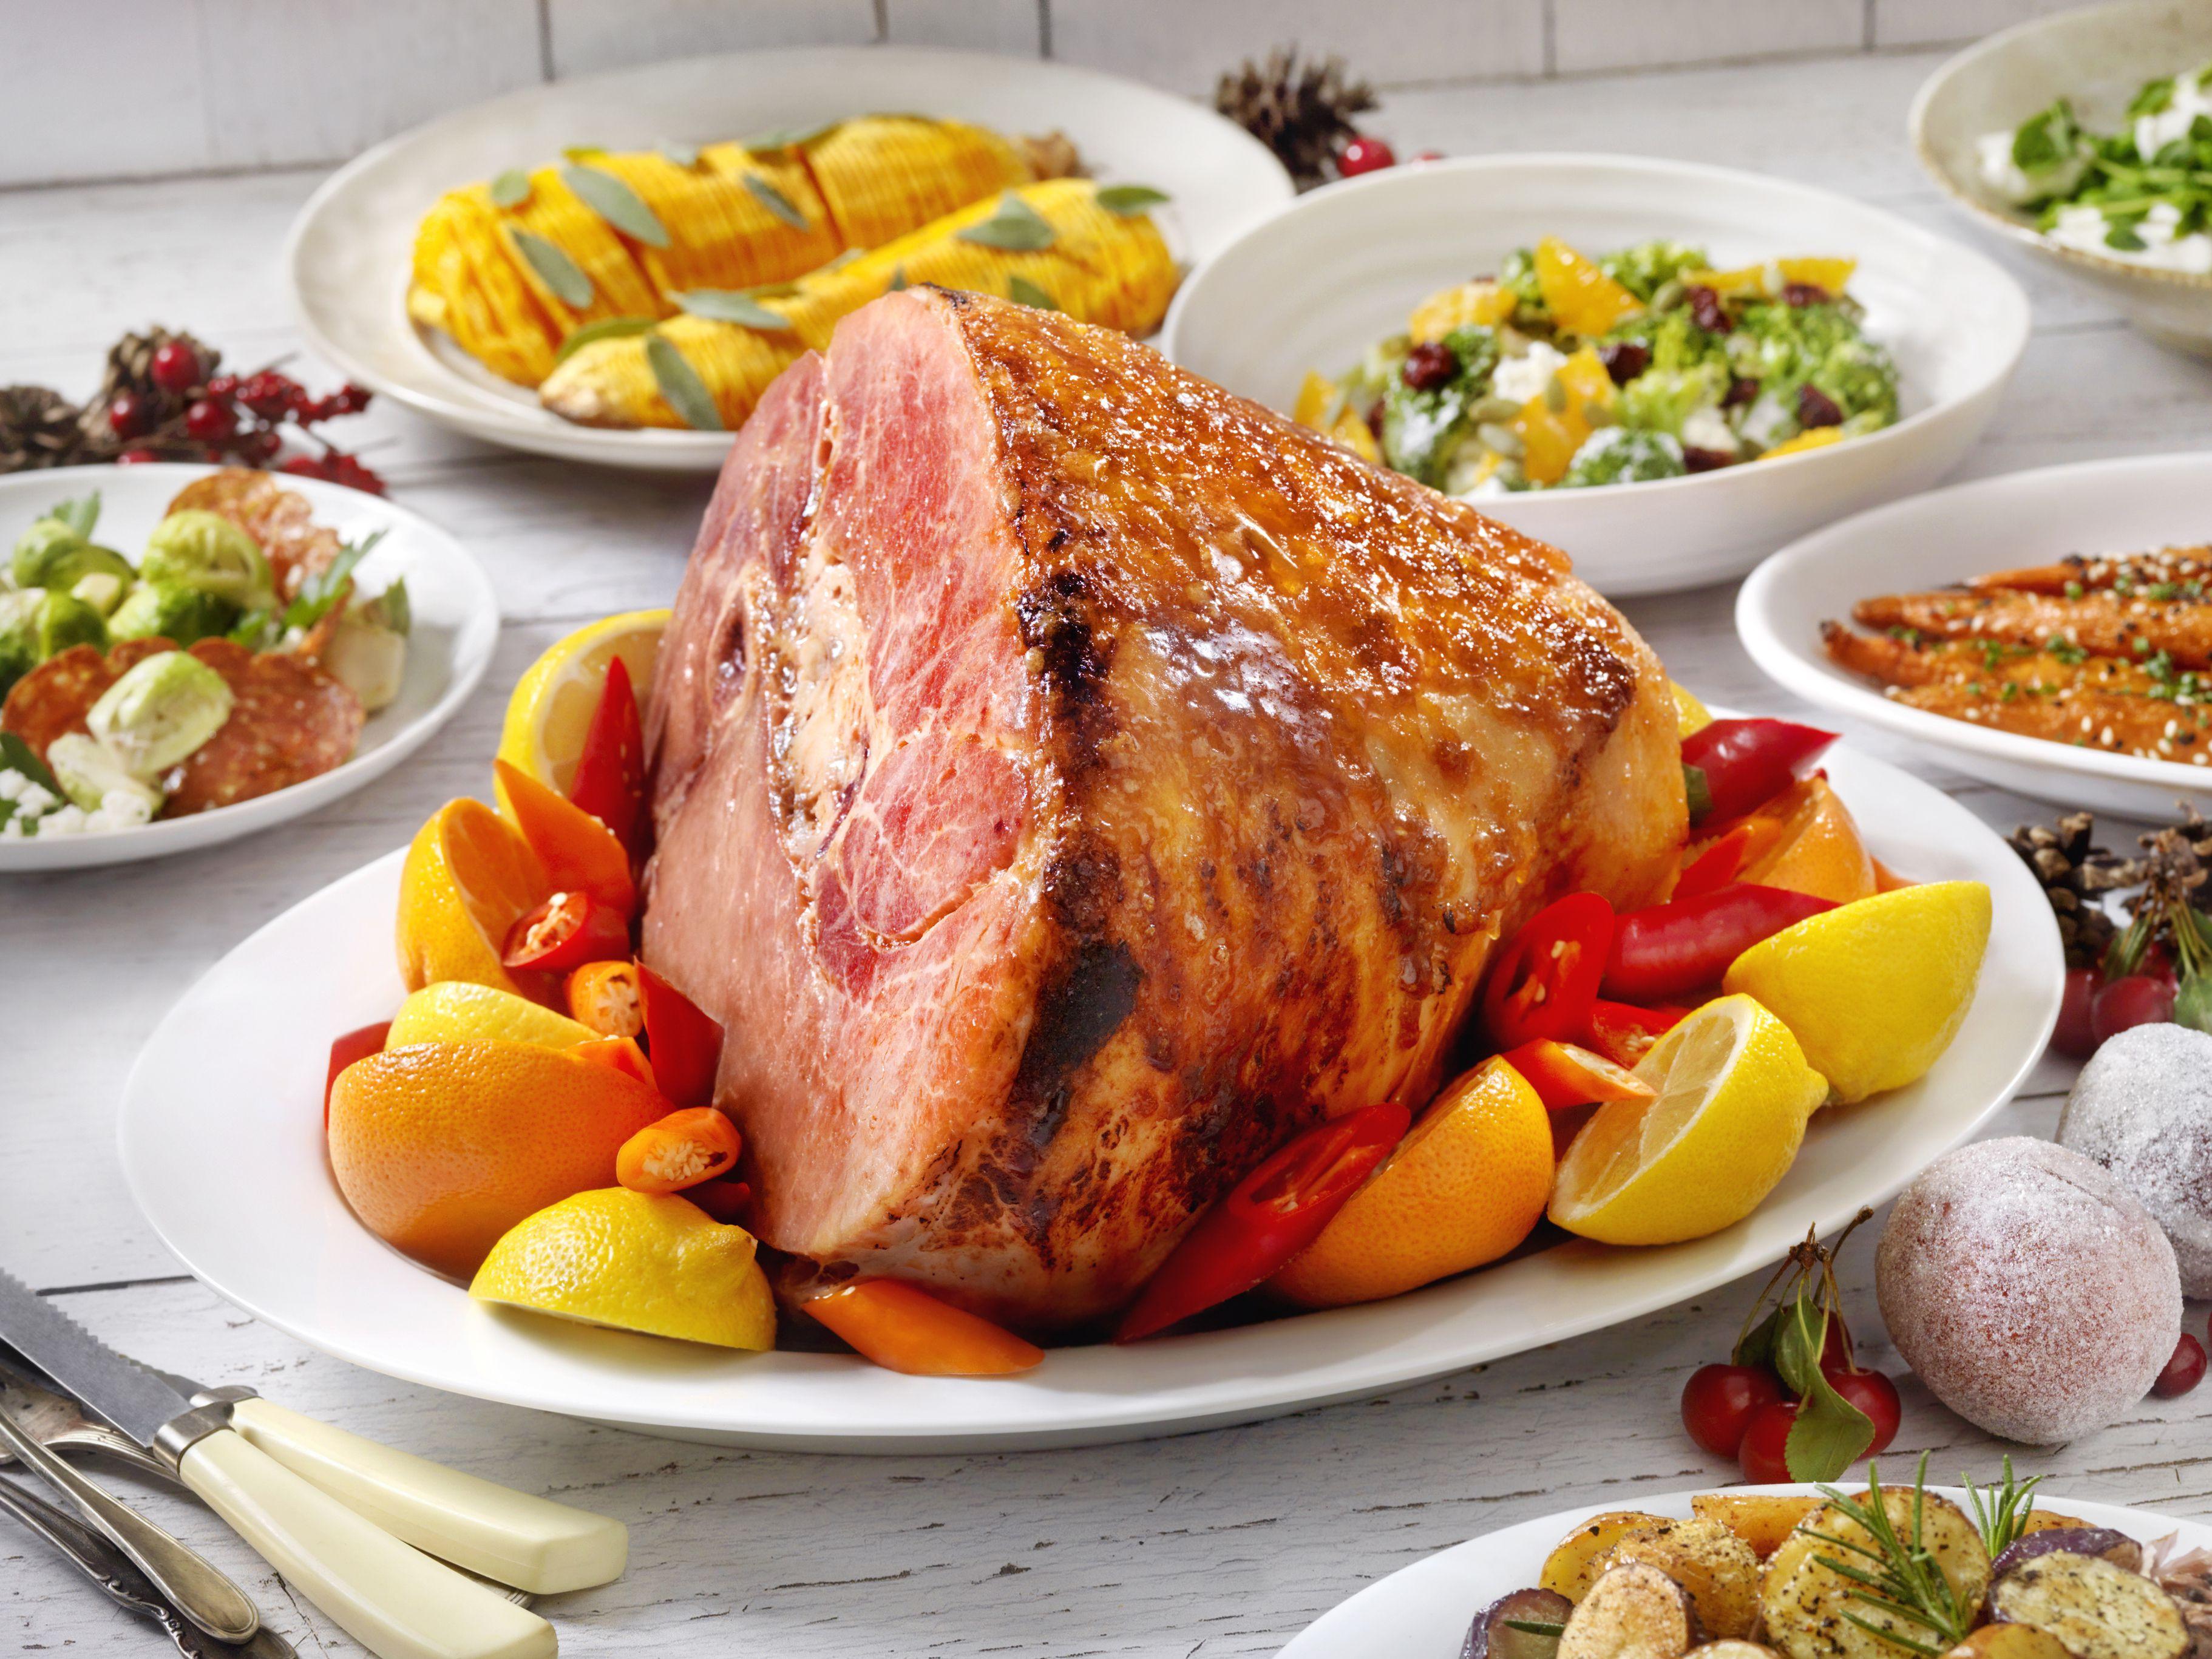 Why Do We Eat Ham On Easter  Why Ham For Easter Dinner